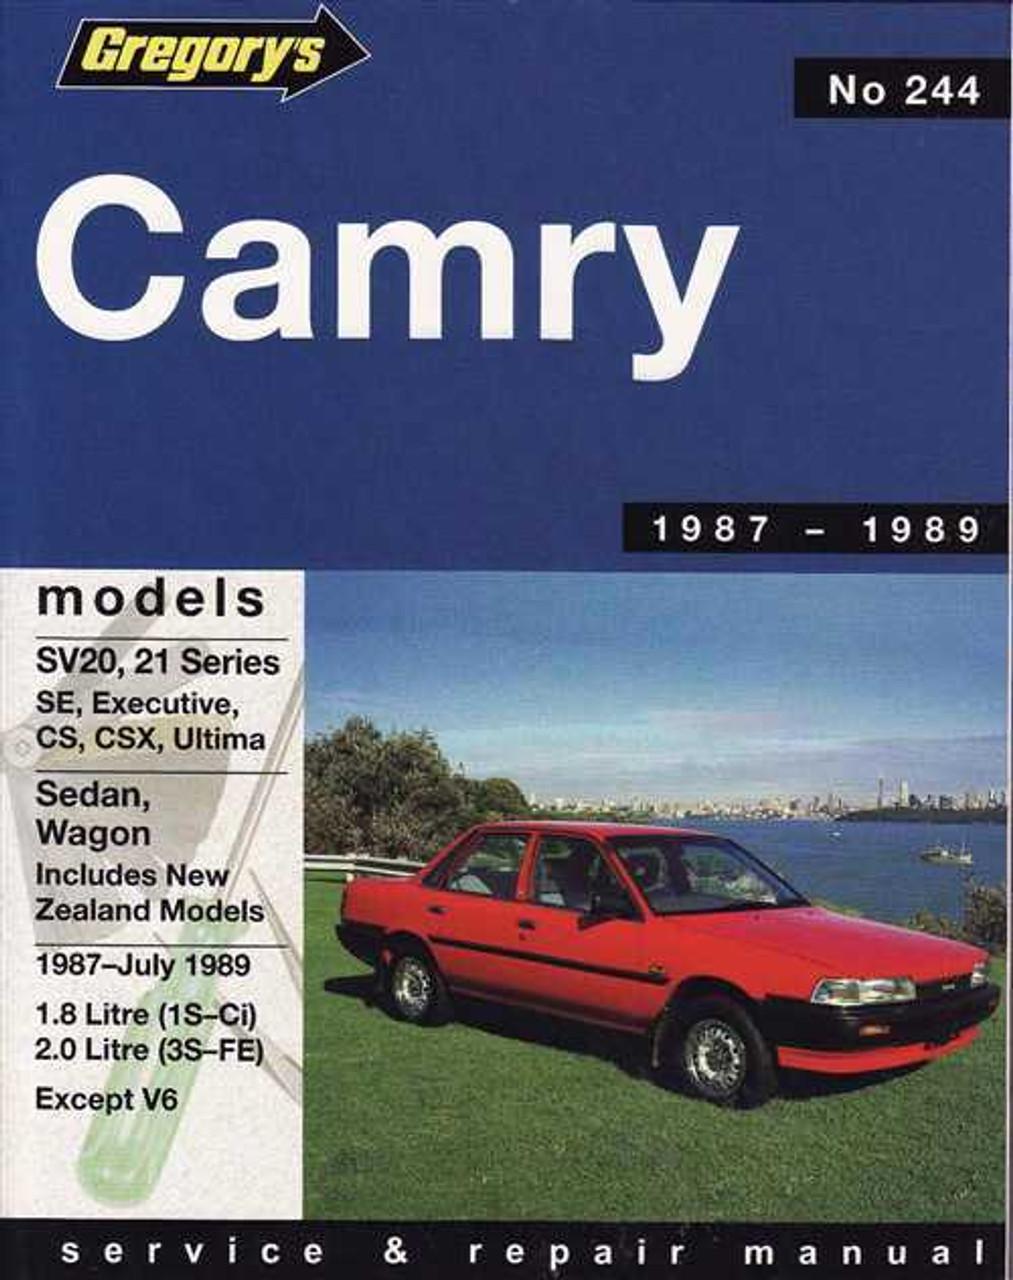 toyota camry sv20 sv21 series 1987 1989 workshop manual rh automotobookshop com au 1989 toyota camry manual transmission 1989 toyota camry manual transmission